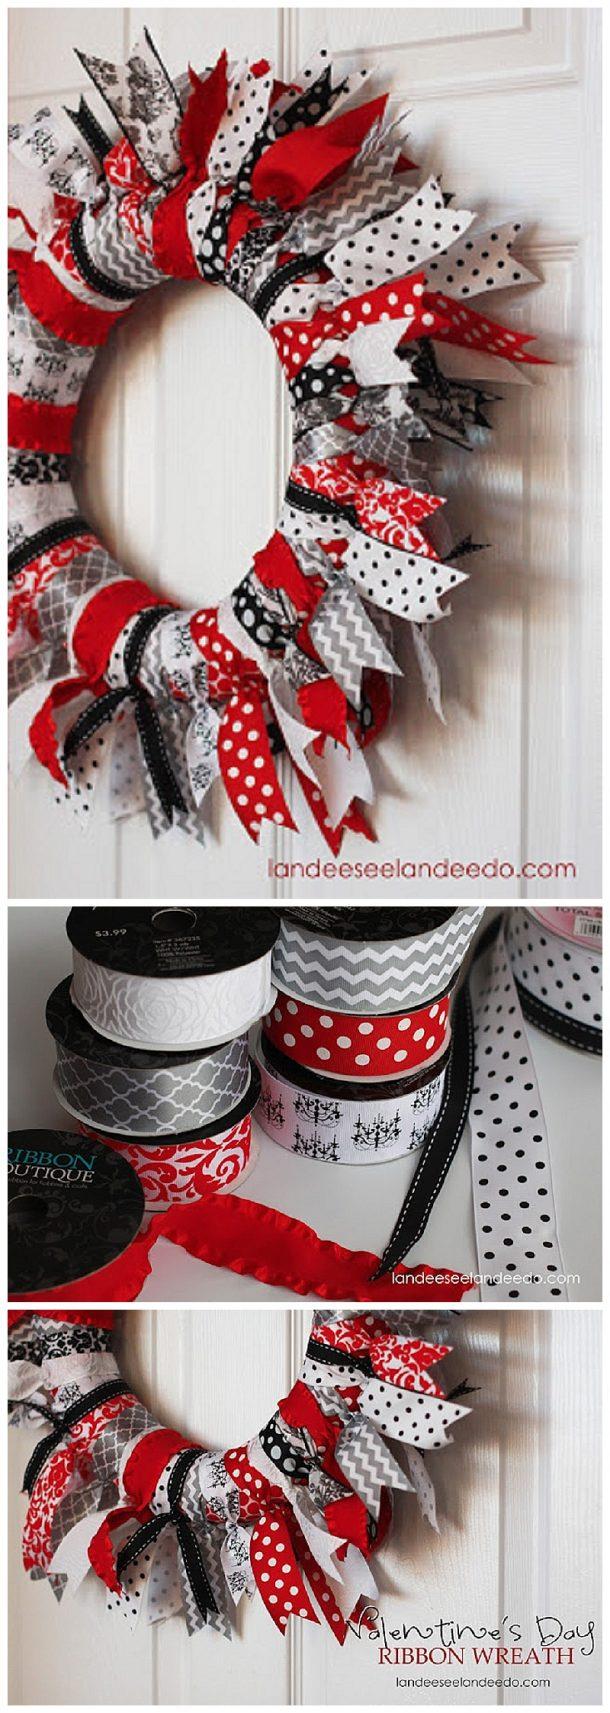 Easy DIY Valentine's Day Ribbon Wreath Decoration Tutorial